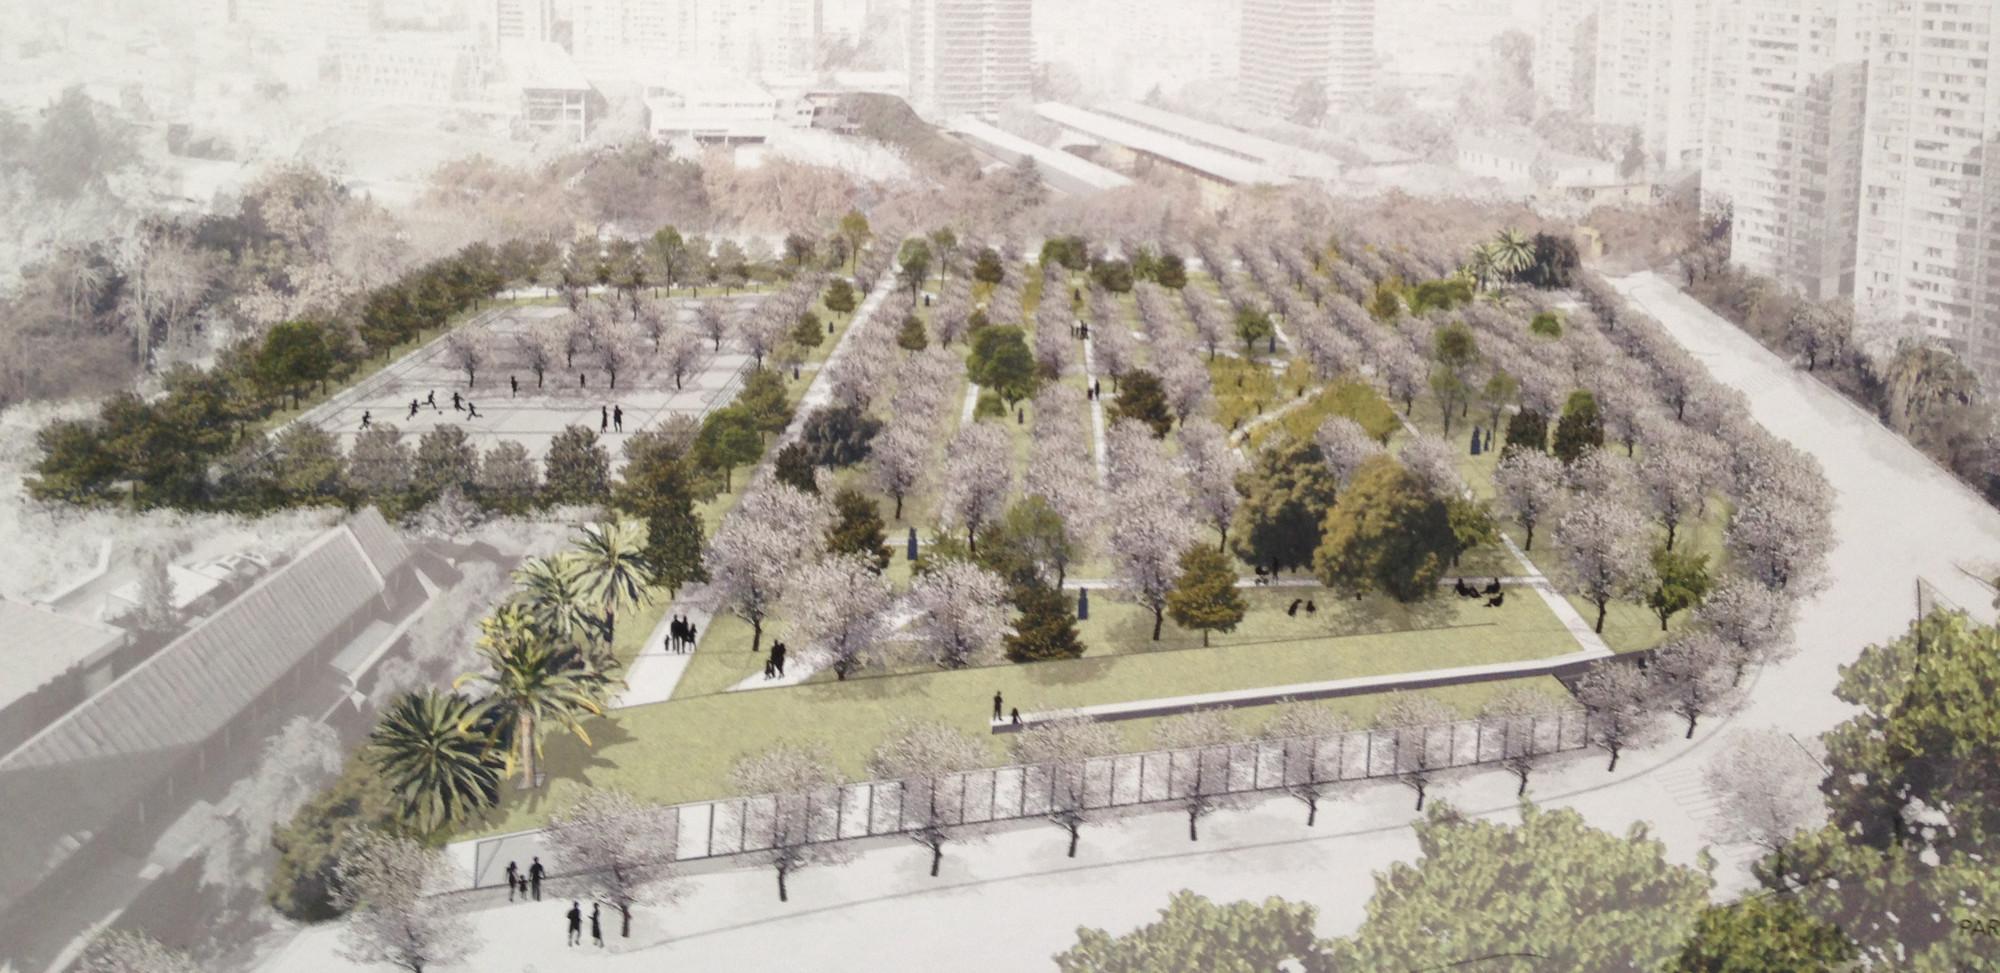 Render Propuesta Jadue-Livingstone. Image © Plataforma Arquitectura